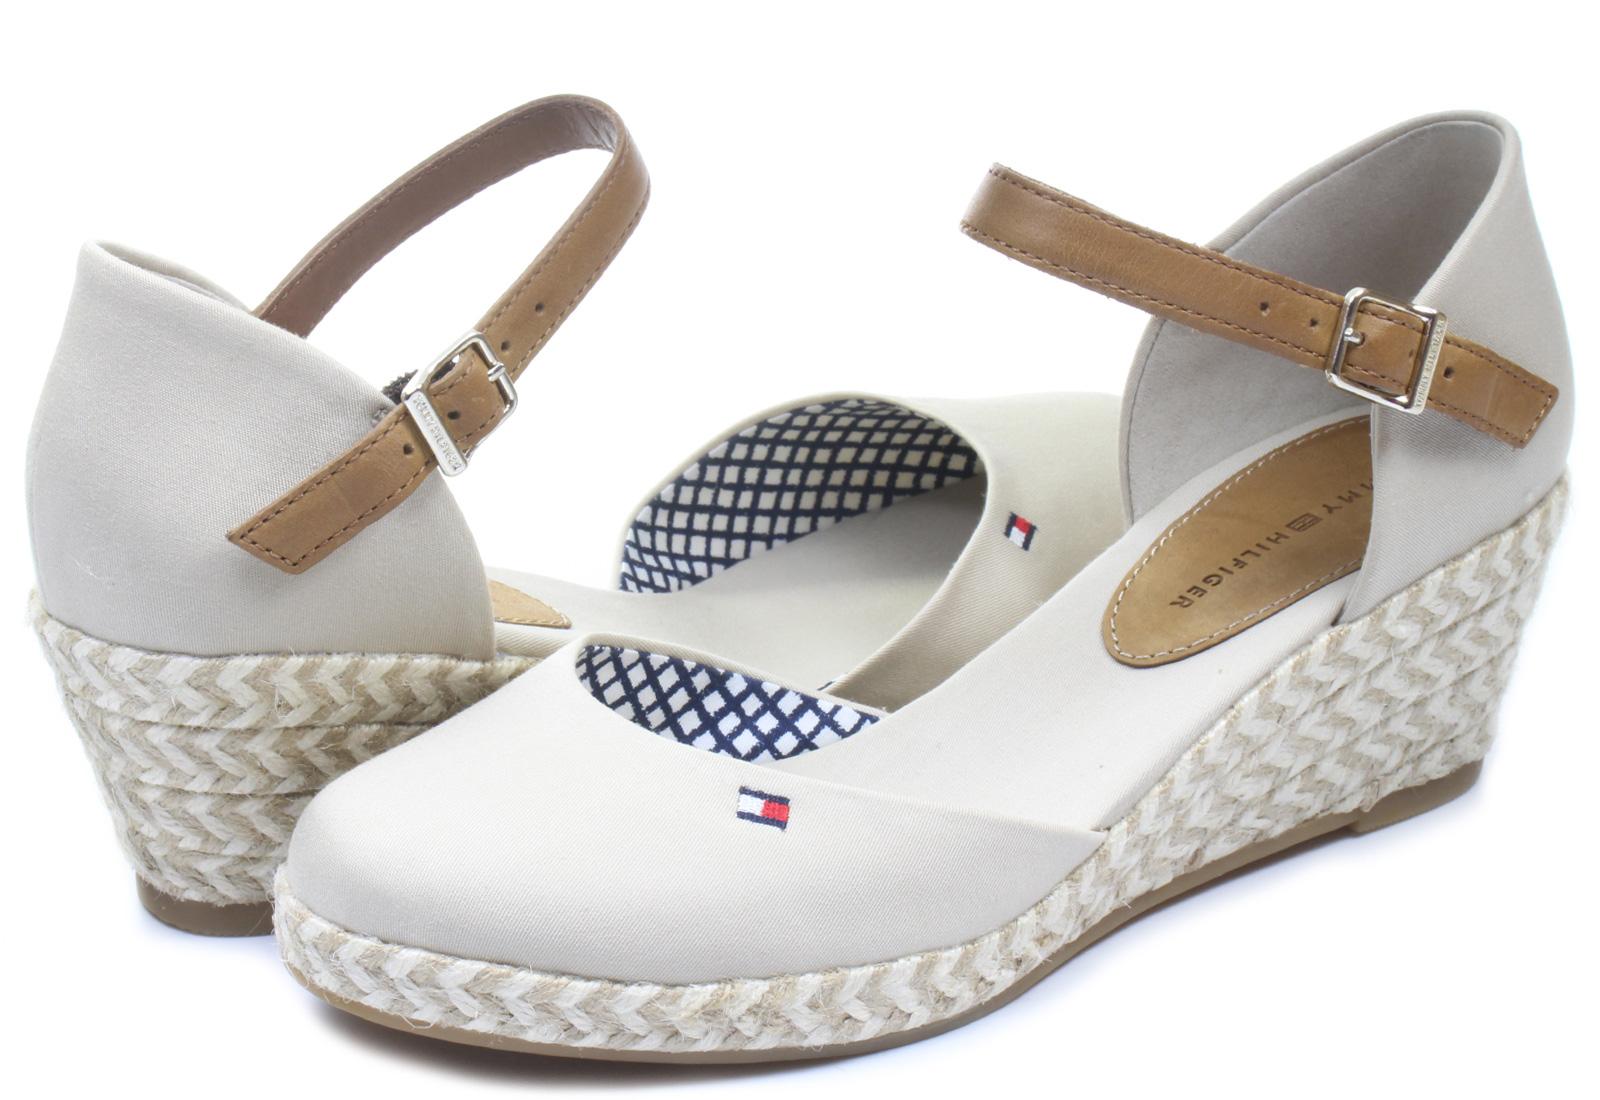 tommy hilfiger sandals elba 13 14s 7423 261 online shop for sneakers shoes and boots. Black Bedroom Furniture Sets. Home Design Ideas